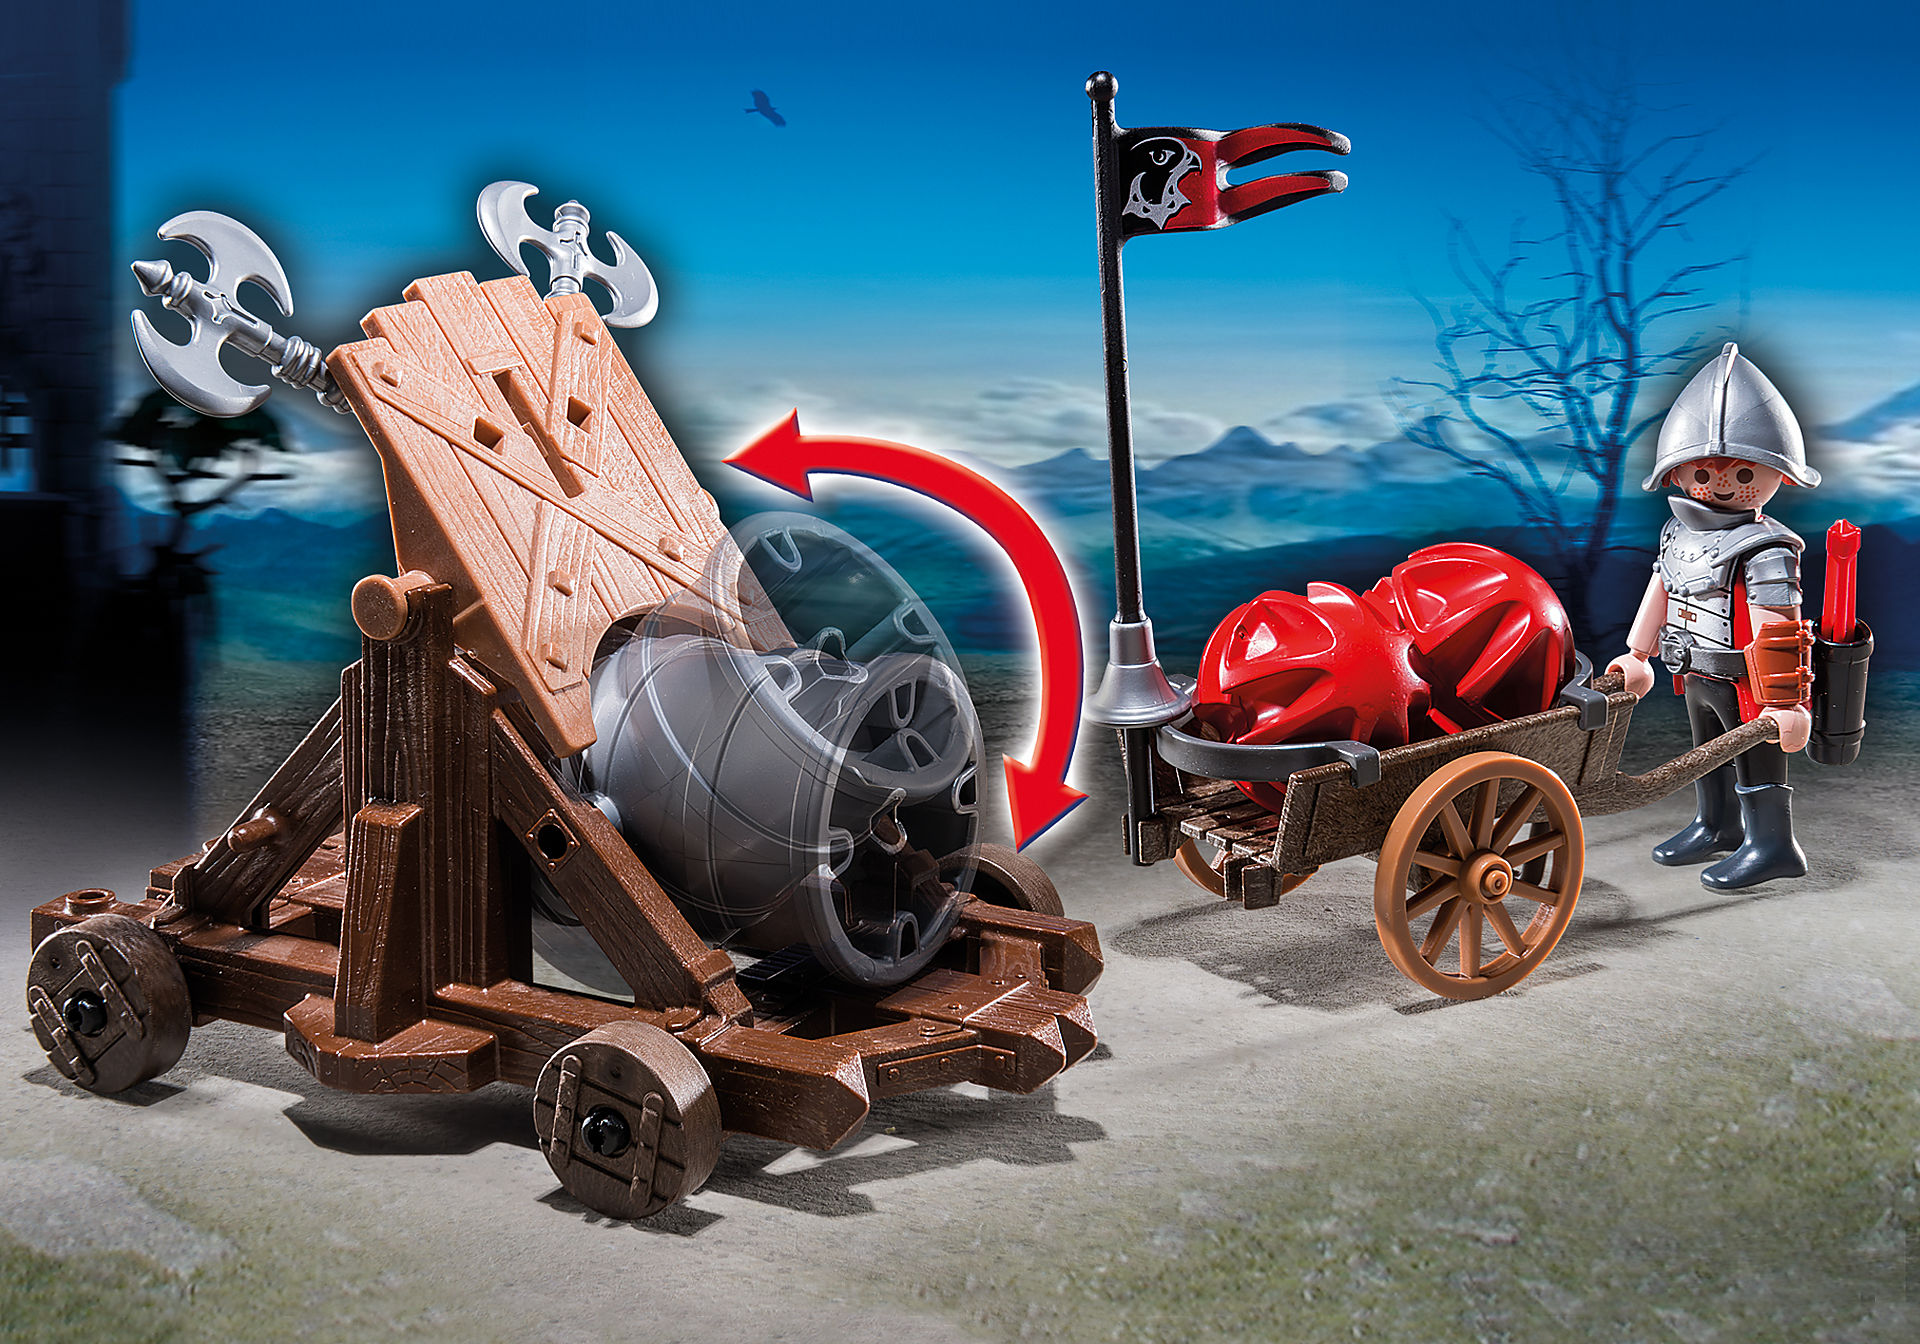 http://media.playmobil.com/i/playmobil/6038_product_extra1/Chevaliers de l`Aigle avec canon géant